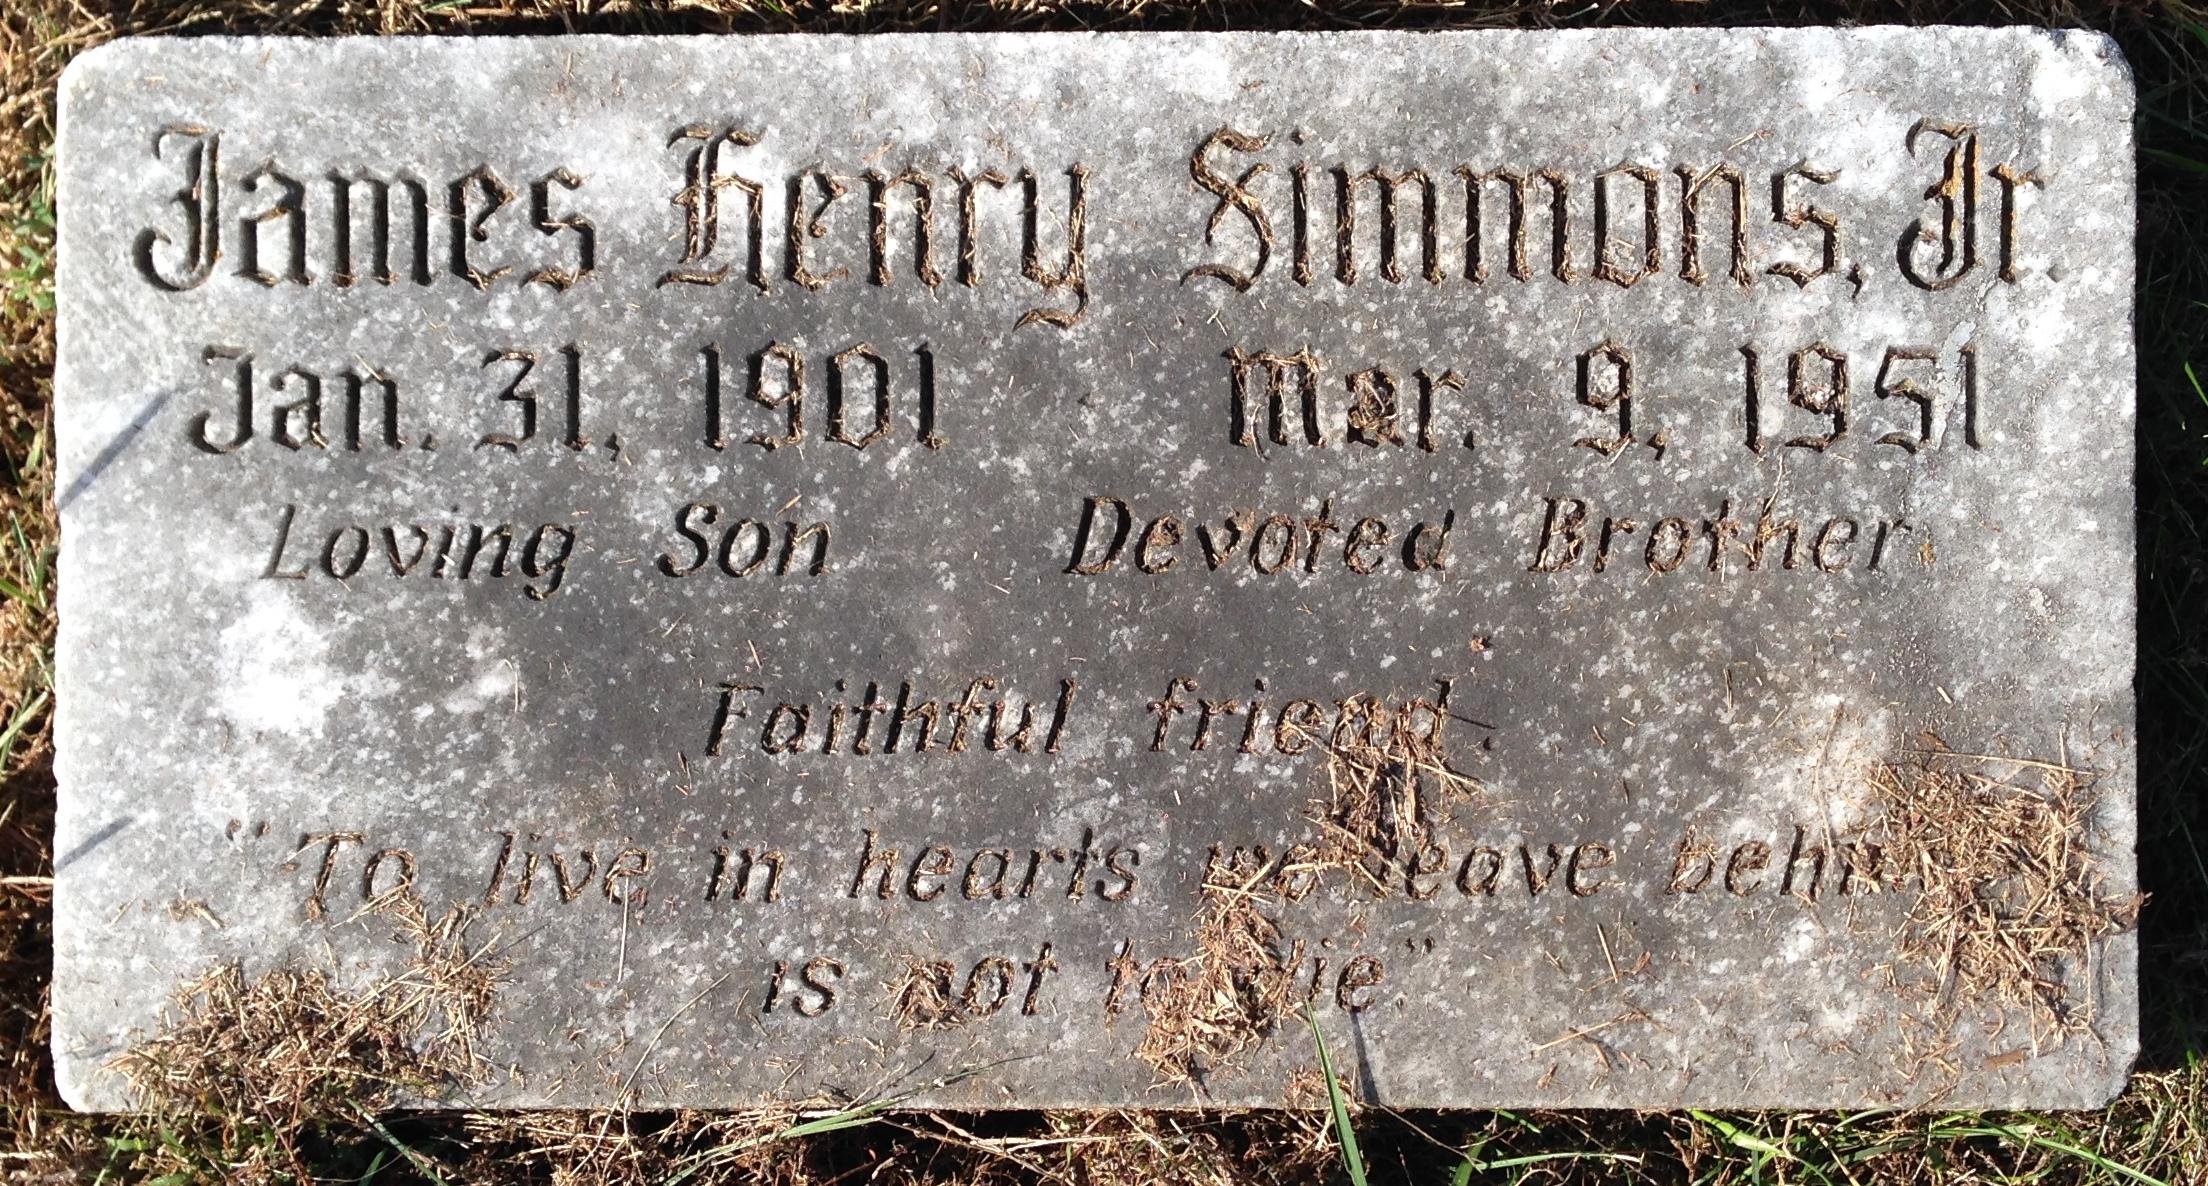 James H Simmons, Jr